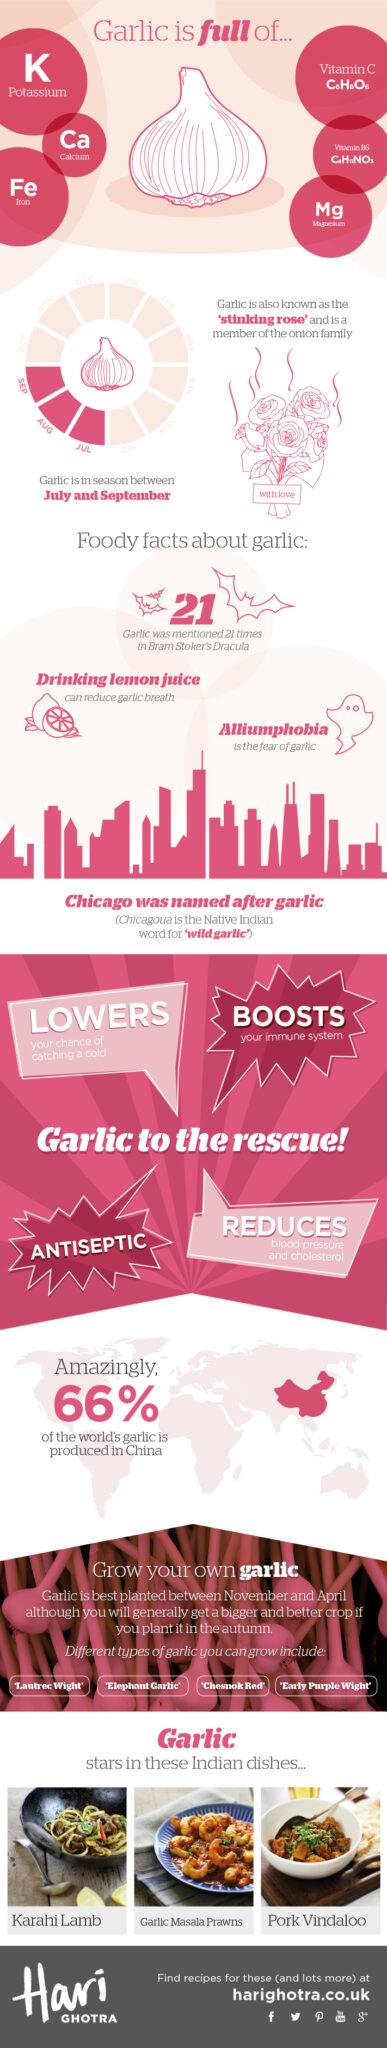 Garlic Infographic ~ https://healthpositiveinfo.com/garlic-infographic.html